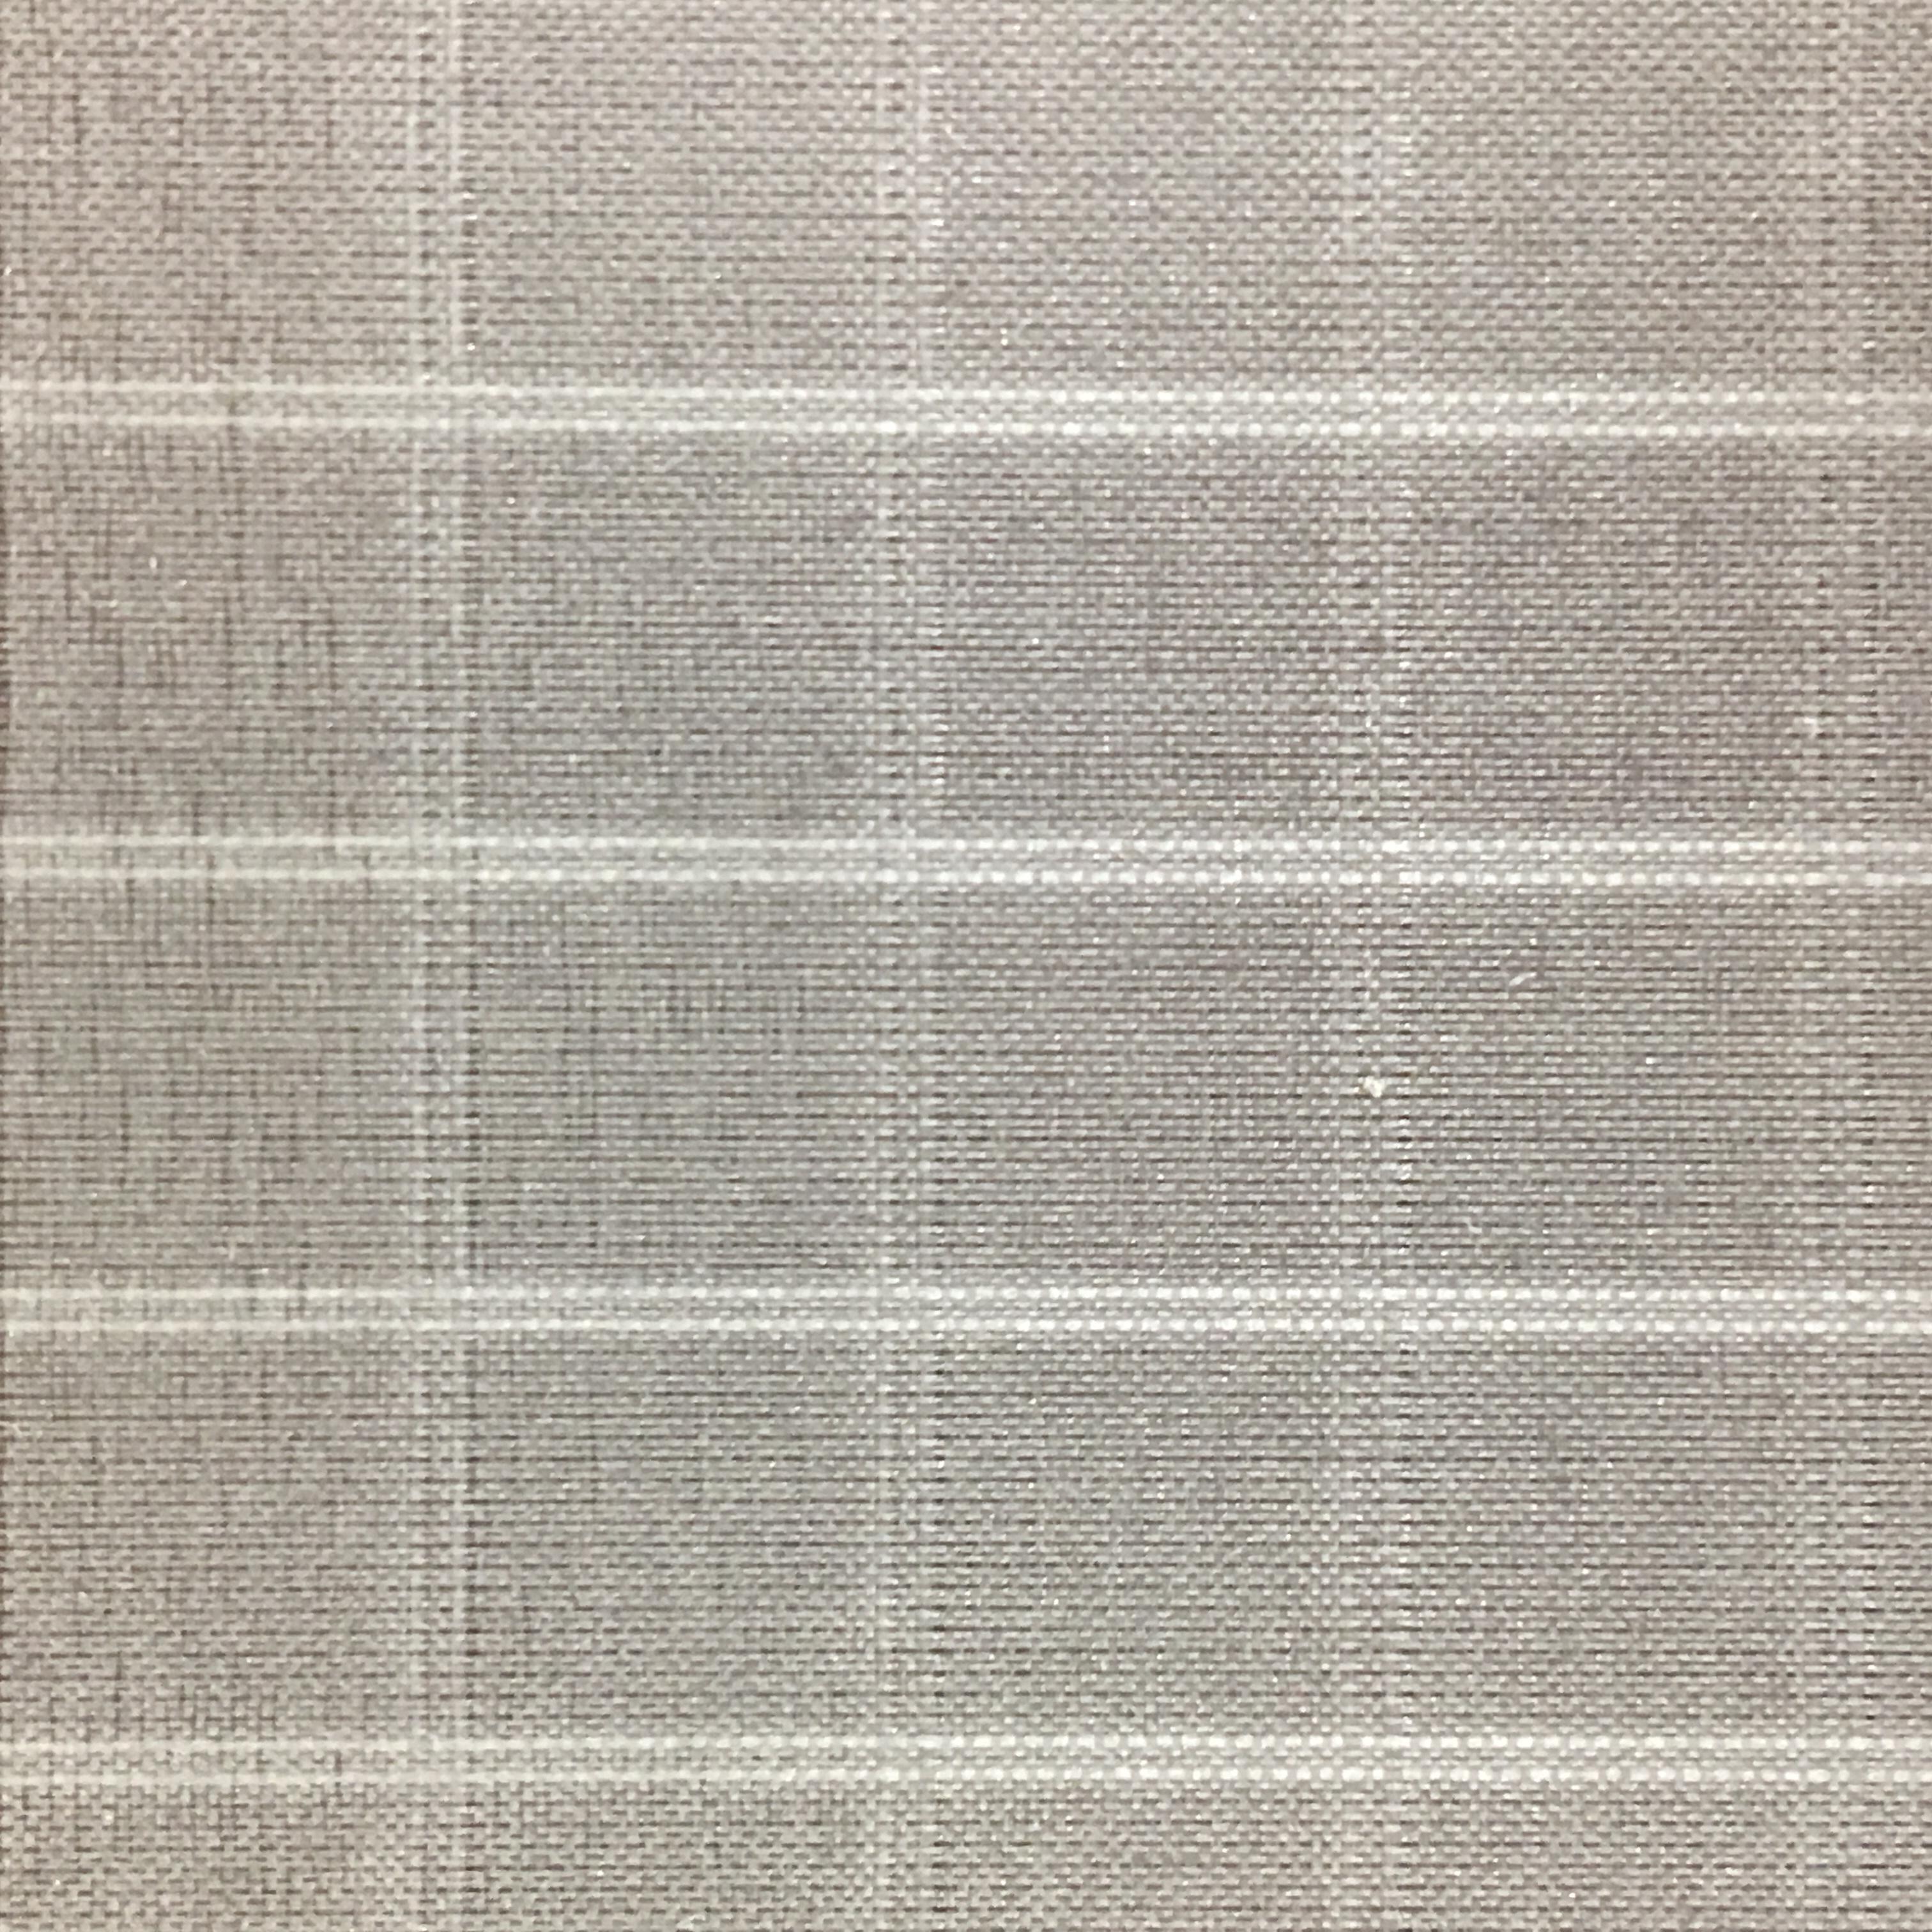 30D Polyester